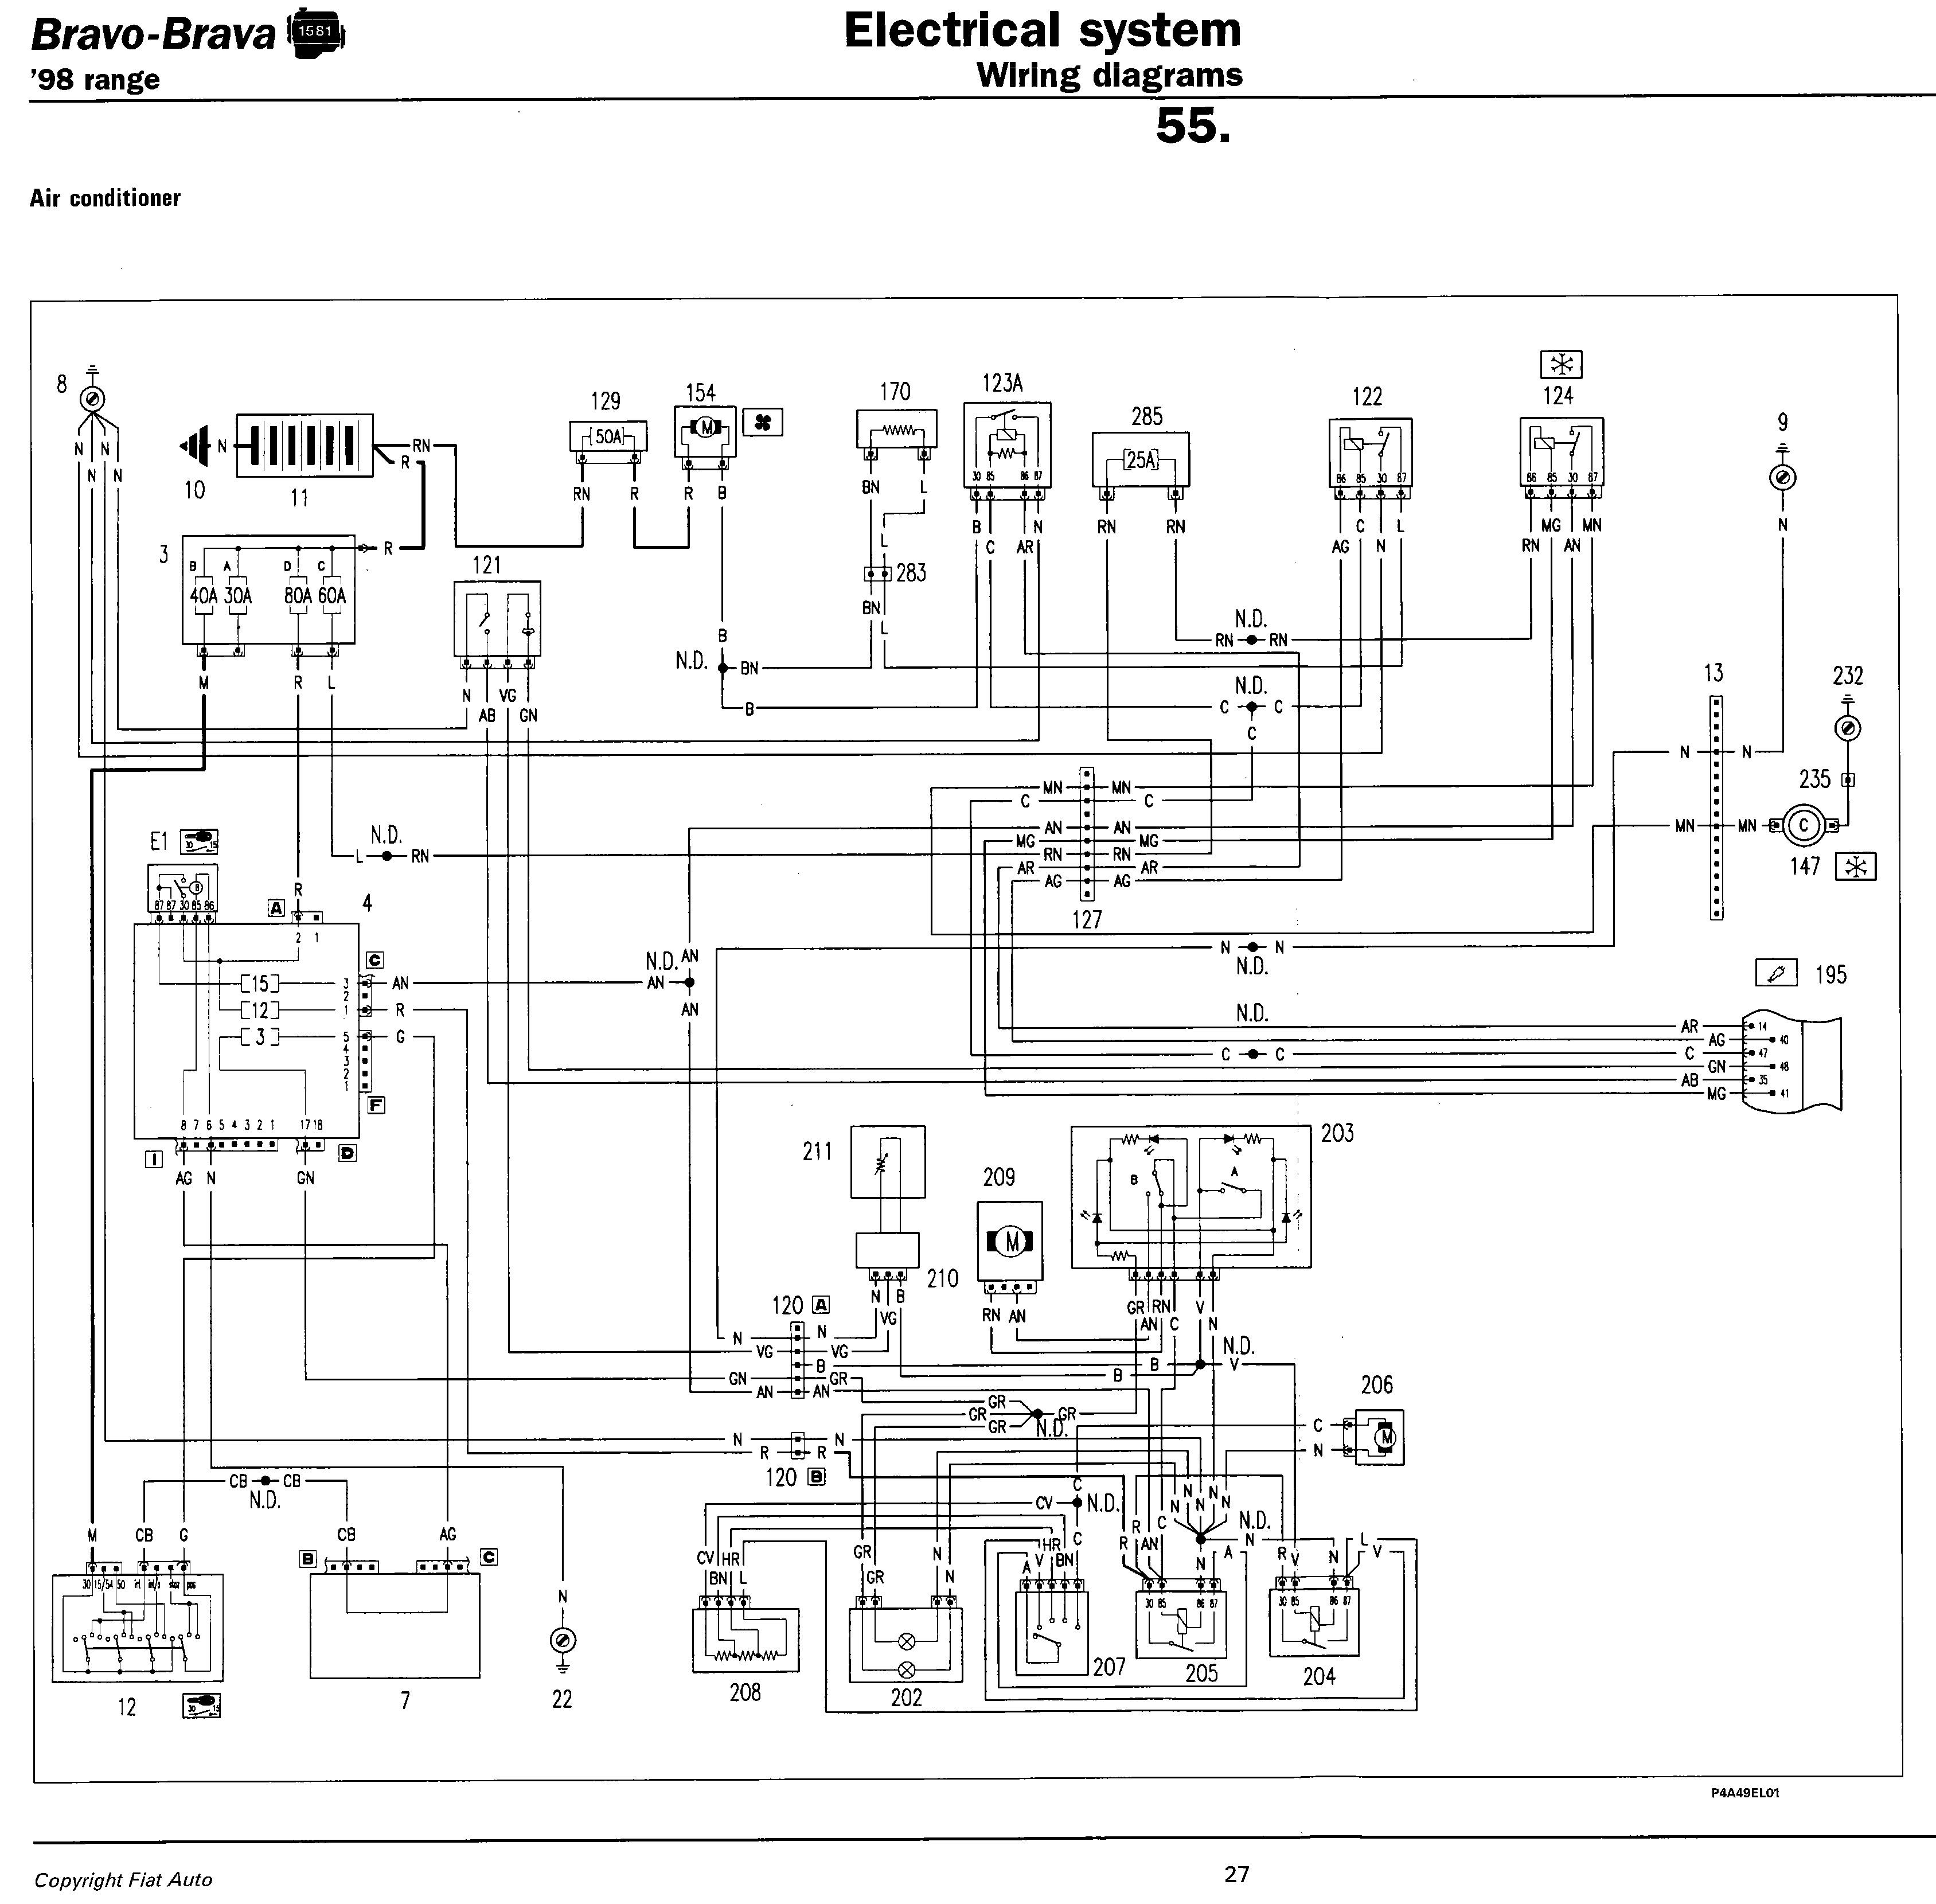 Wire Diagram 2009 Ski Doo Rf Wiring Diagrams Scematic Silverado Third Level 440 Carb